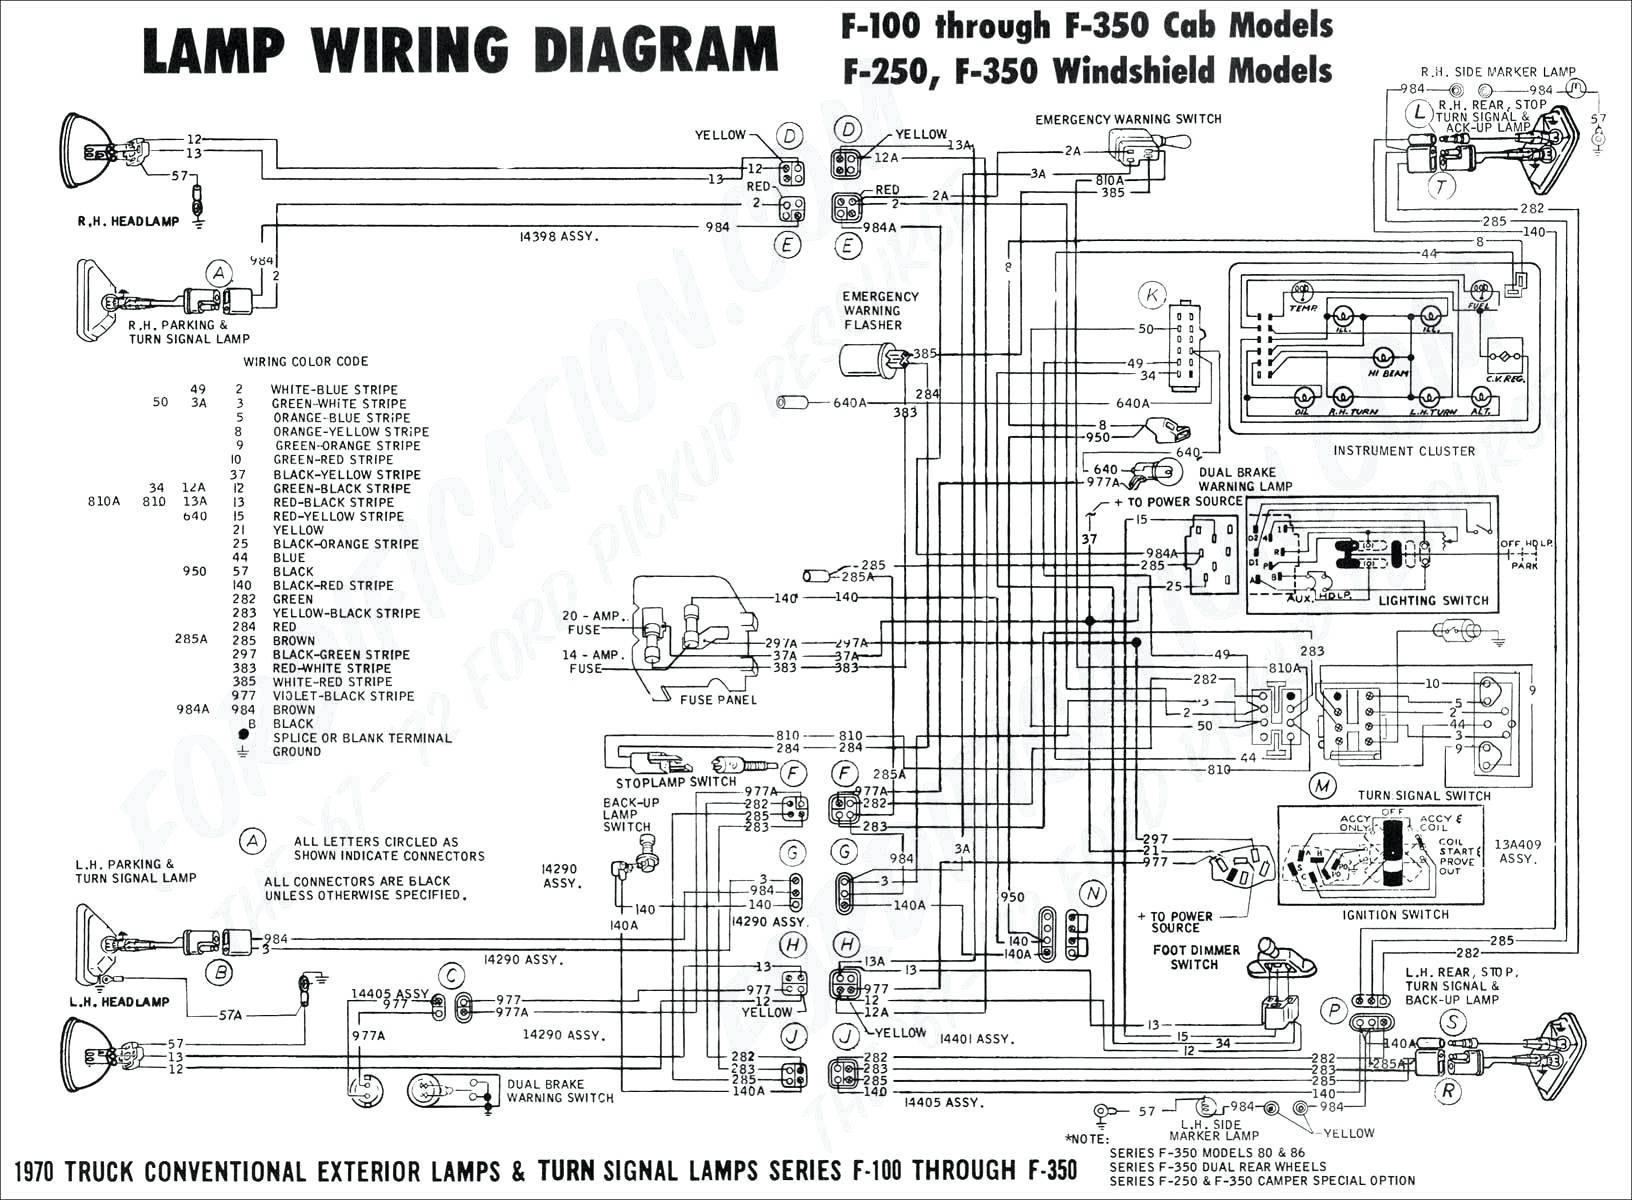 Bw Diagram Of Engine 4 5 Liter Cadillac Schematic